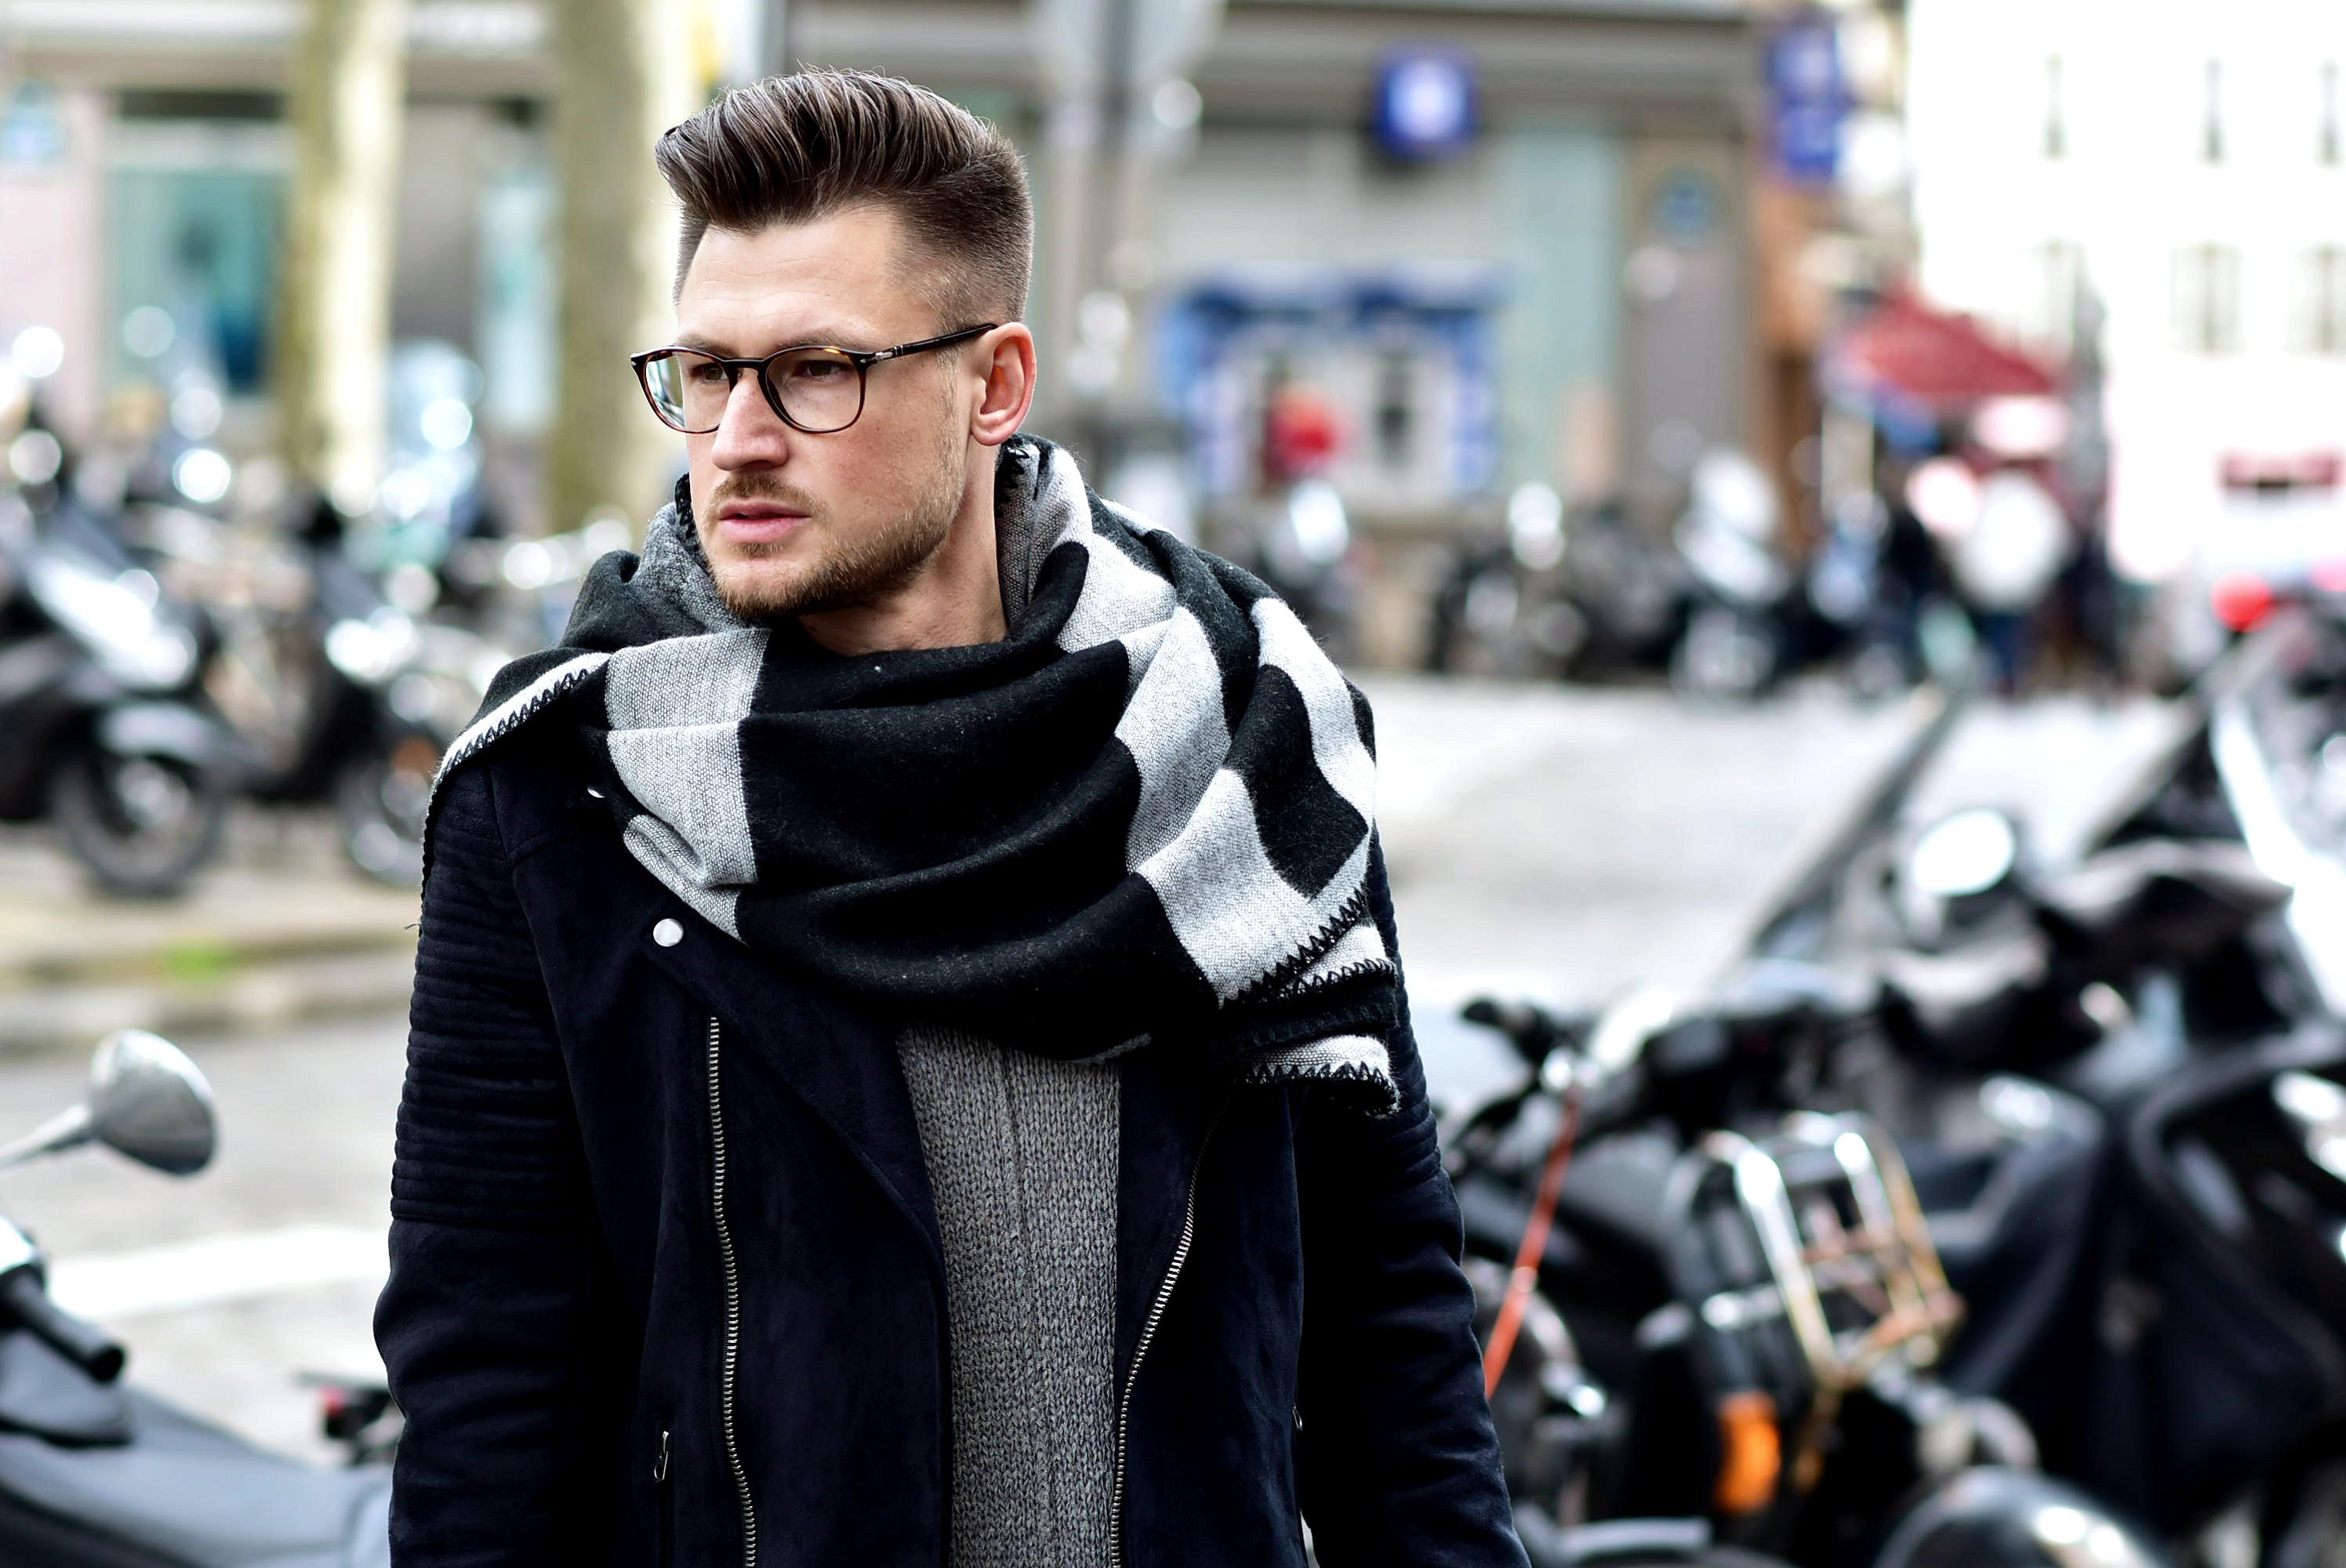 Tommeezjerry-Styleblog-Männerblog-Modeblog-Berlin-Travelblog-Reiseblog-Travel-Paris-Paristrip-Visit-Paris-Sightseeing-Traveldiary